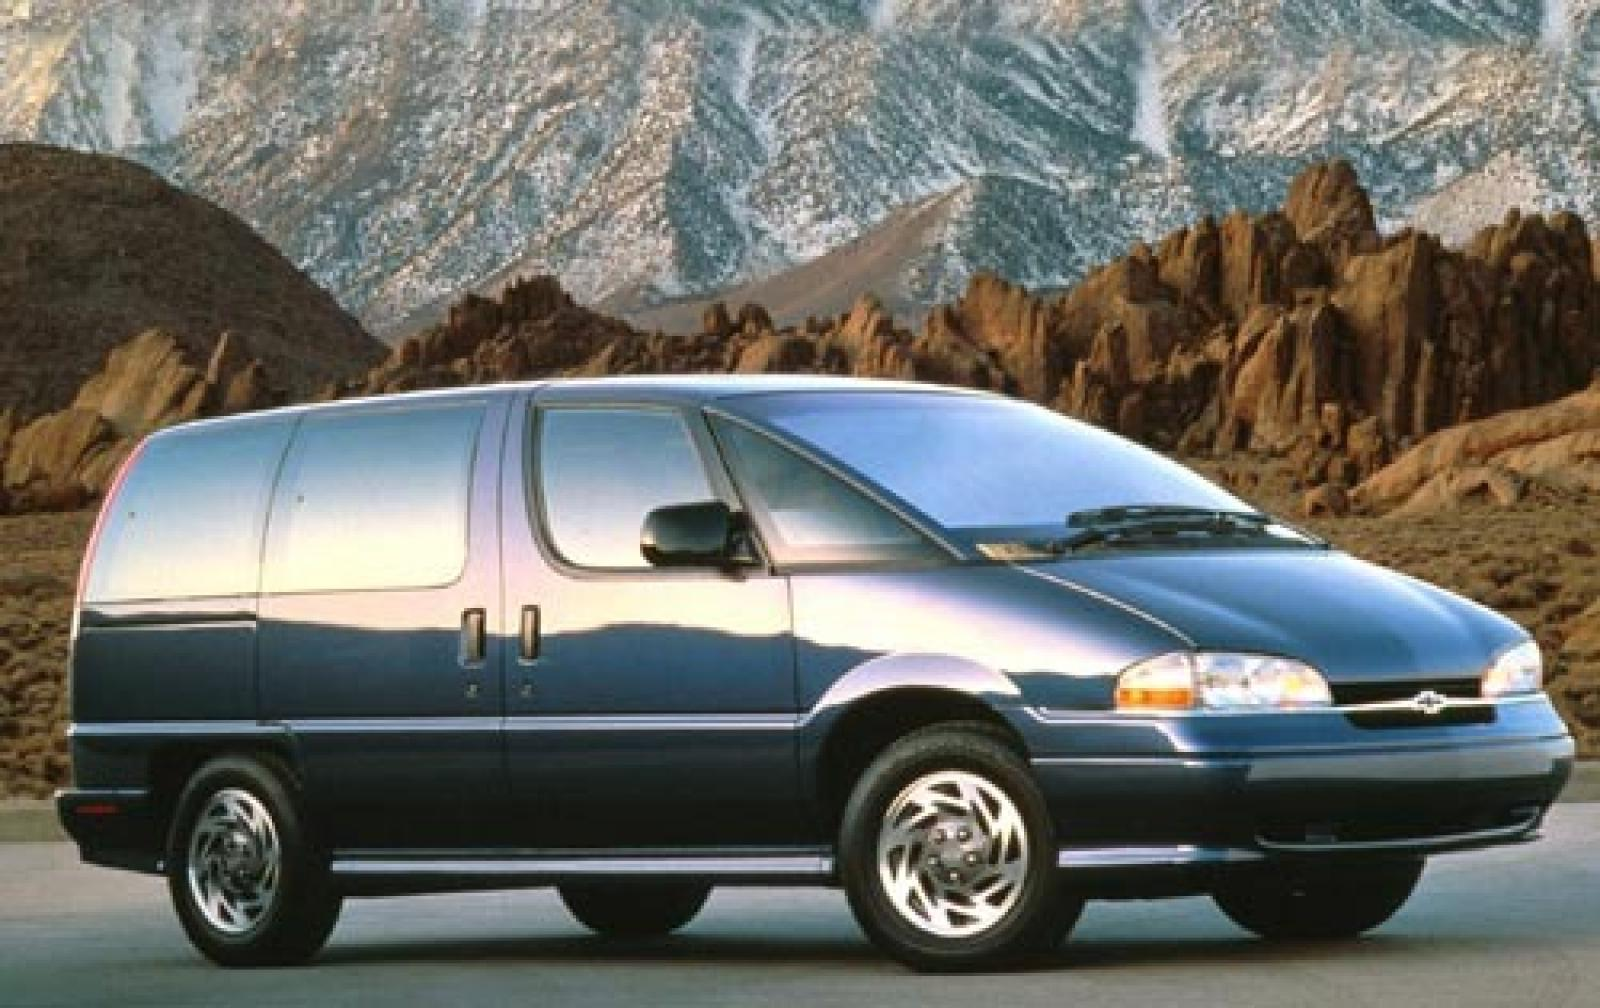 Chevrolet Lumina APV 1989 - 1996 Minivan #4